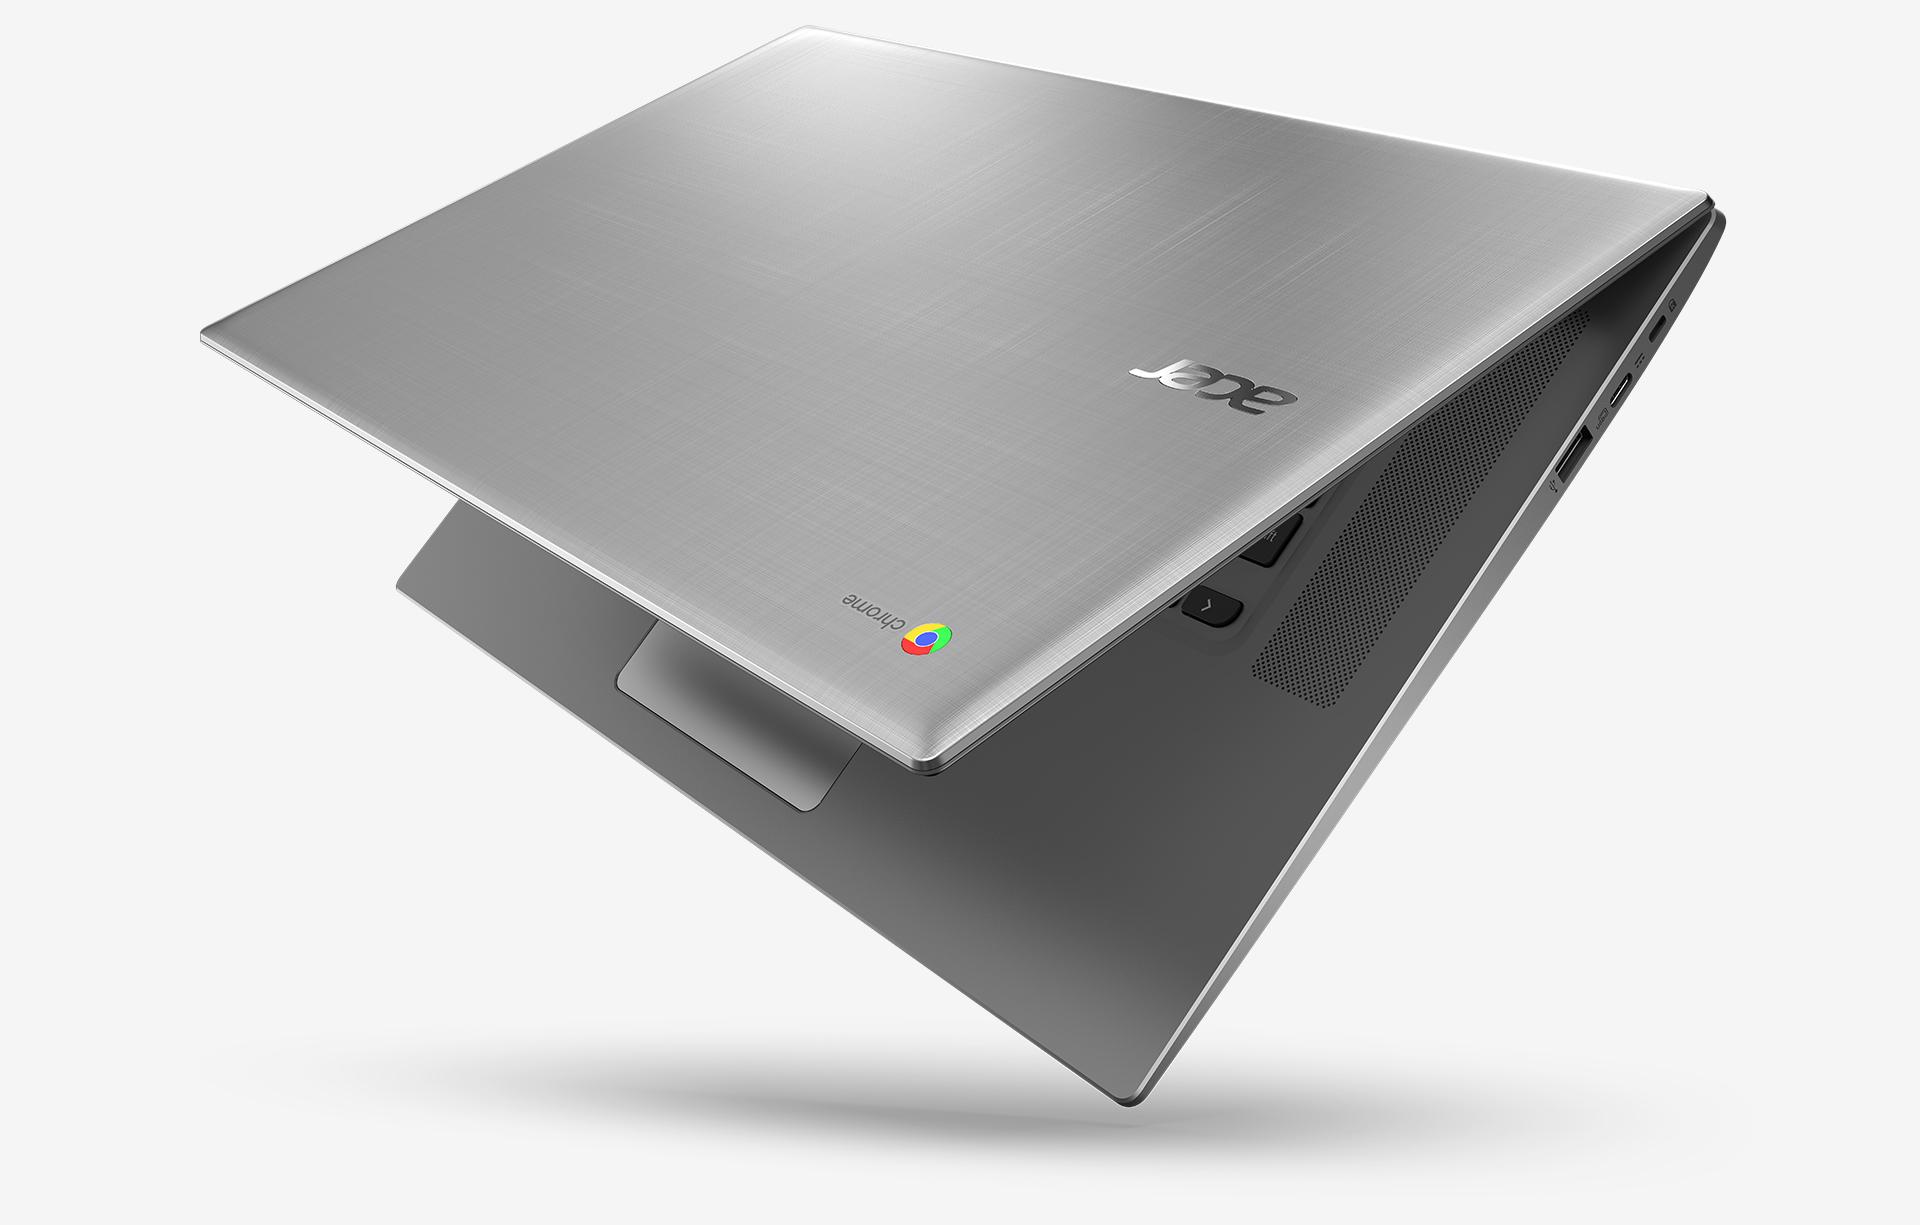 Acer Chromebook 15 CB315 - overview design - Large